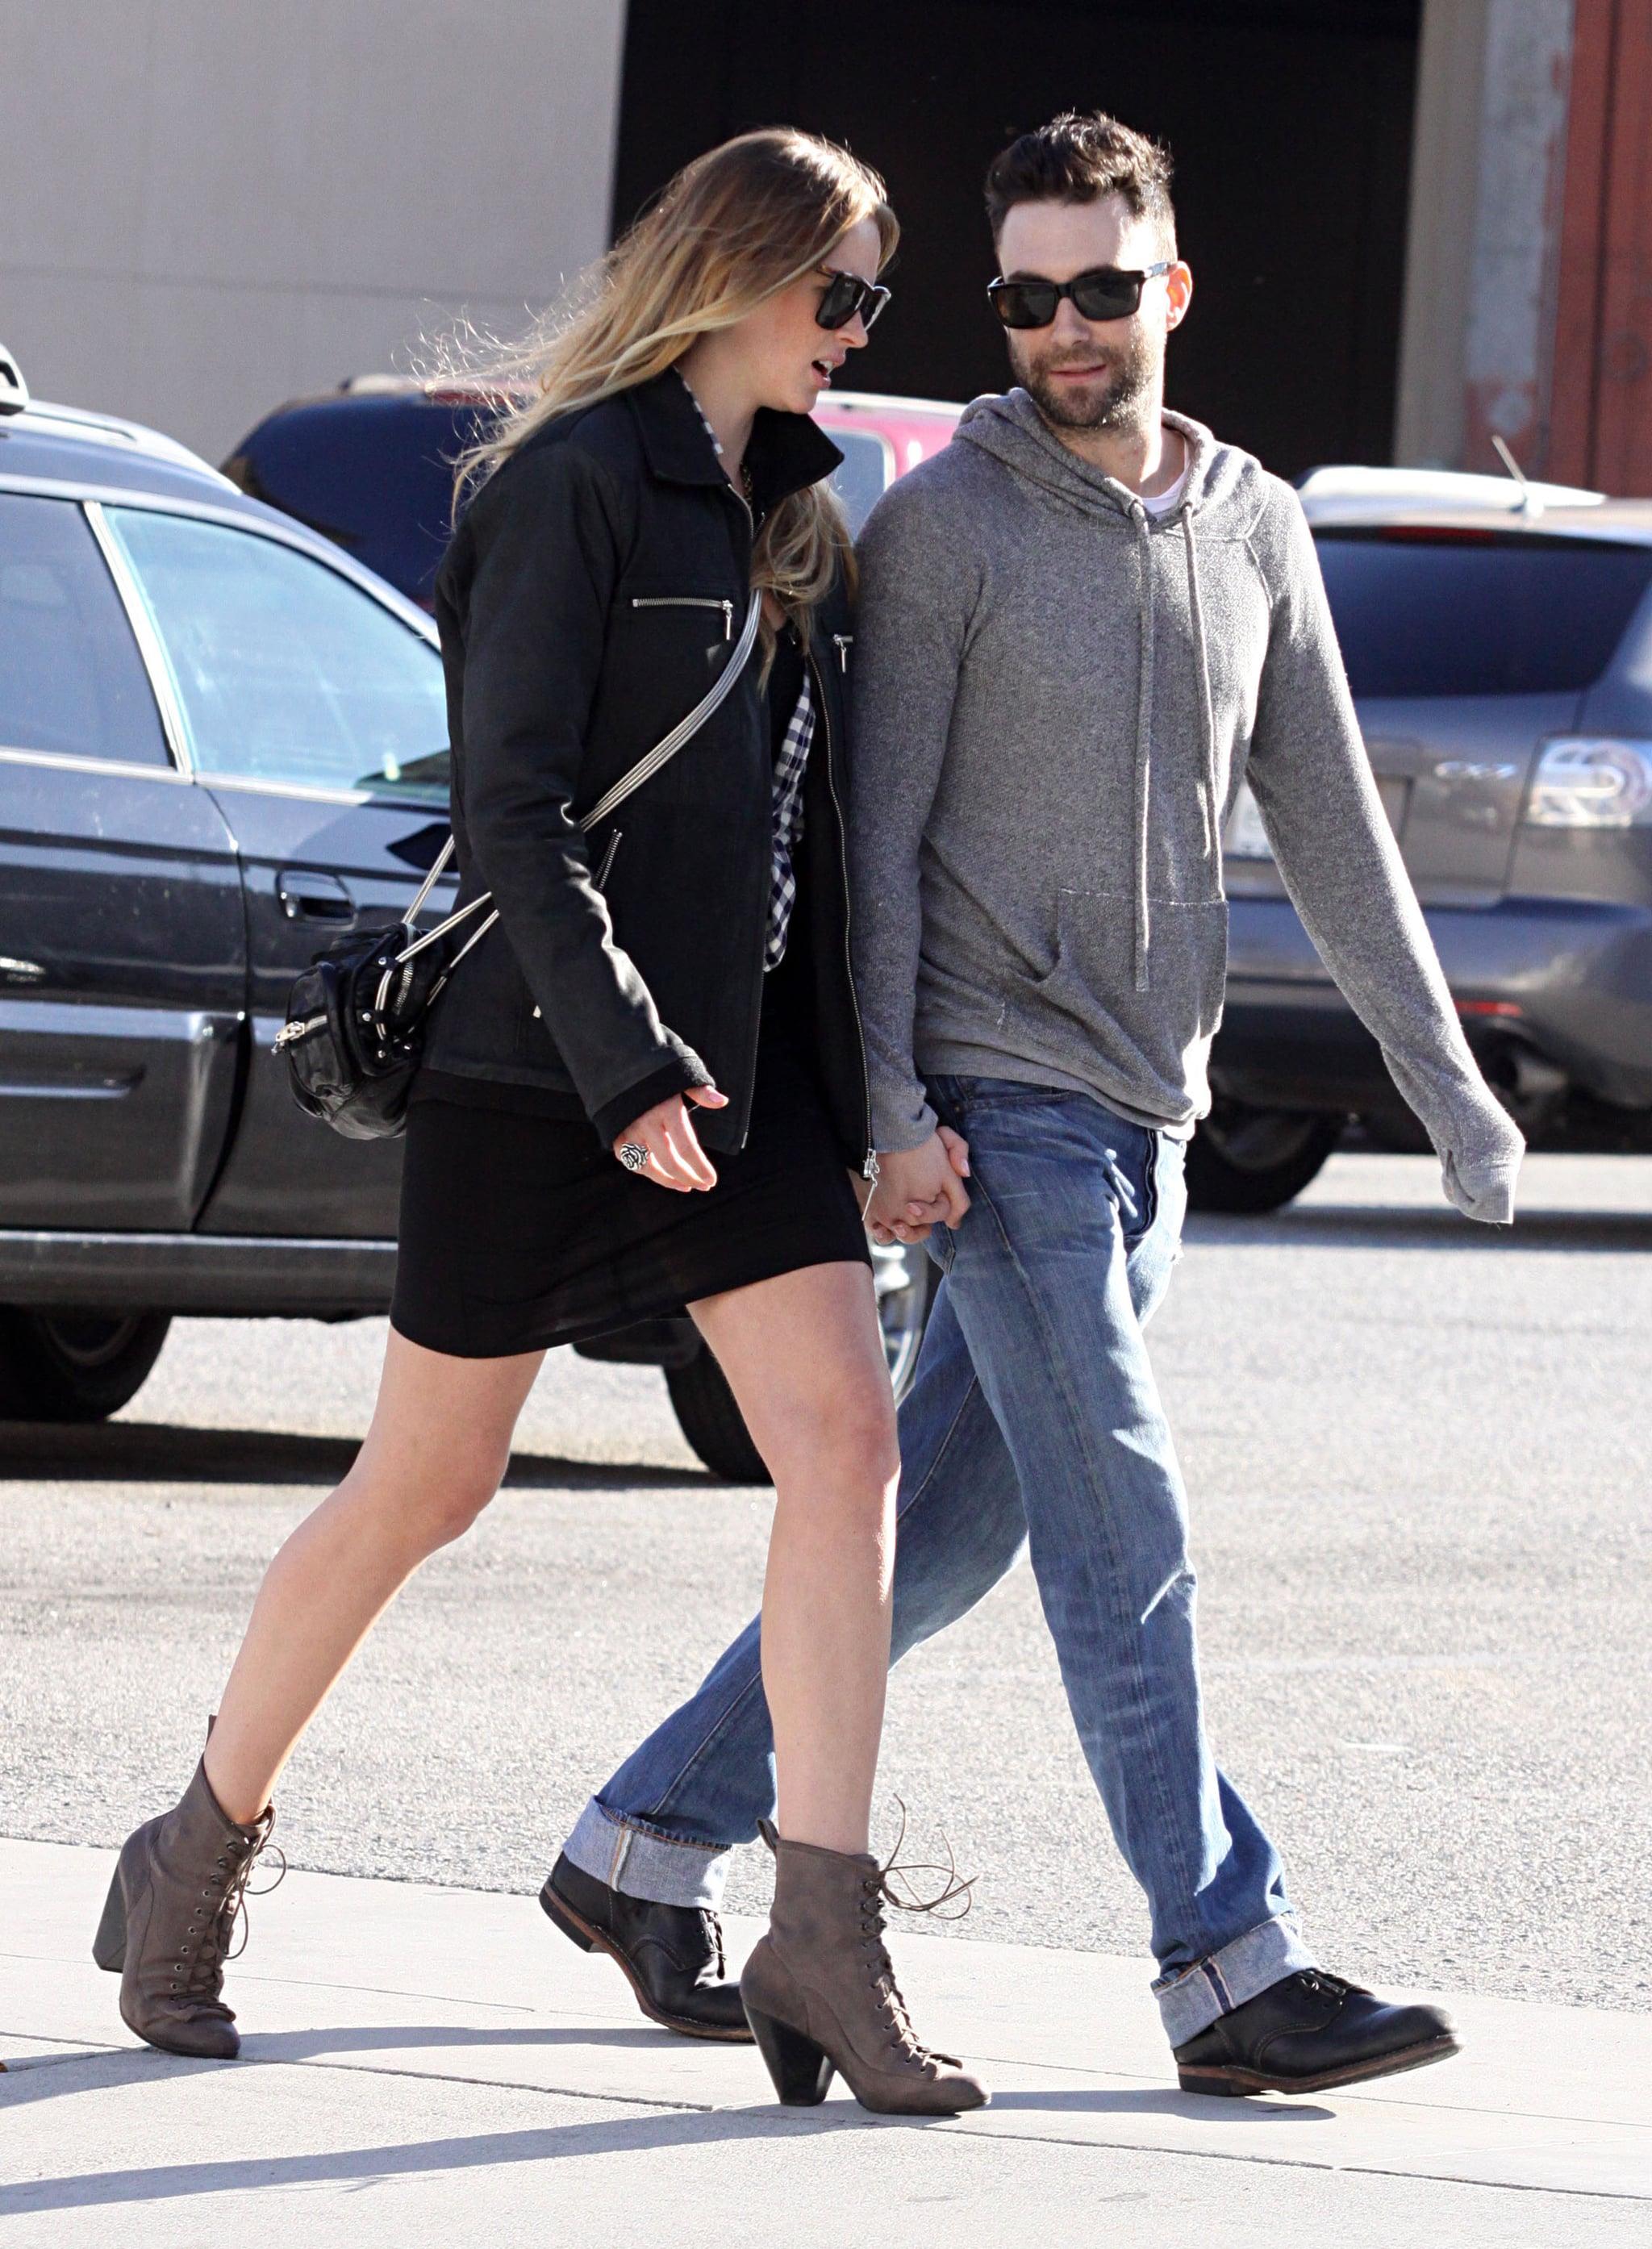 Feb. 20: In Beverly Hills